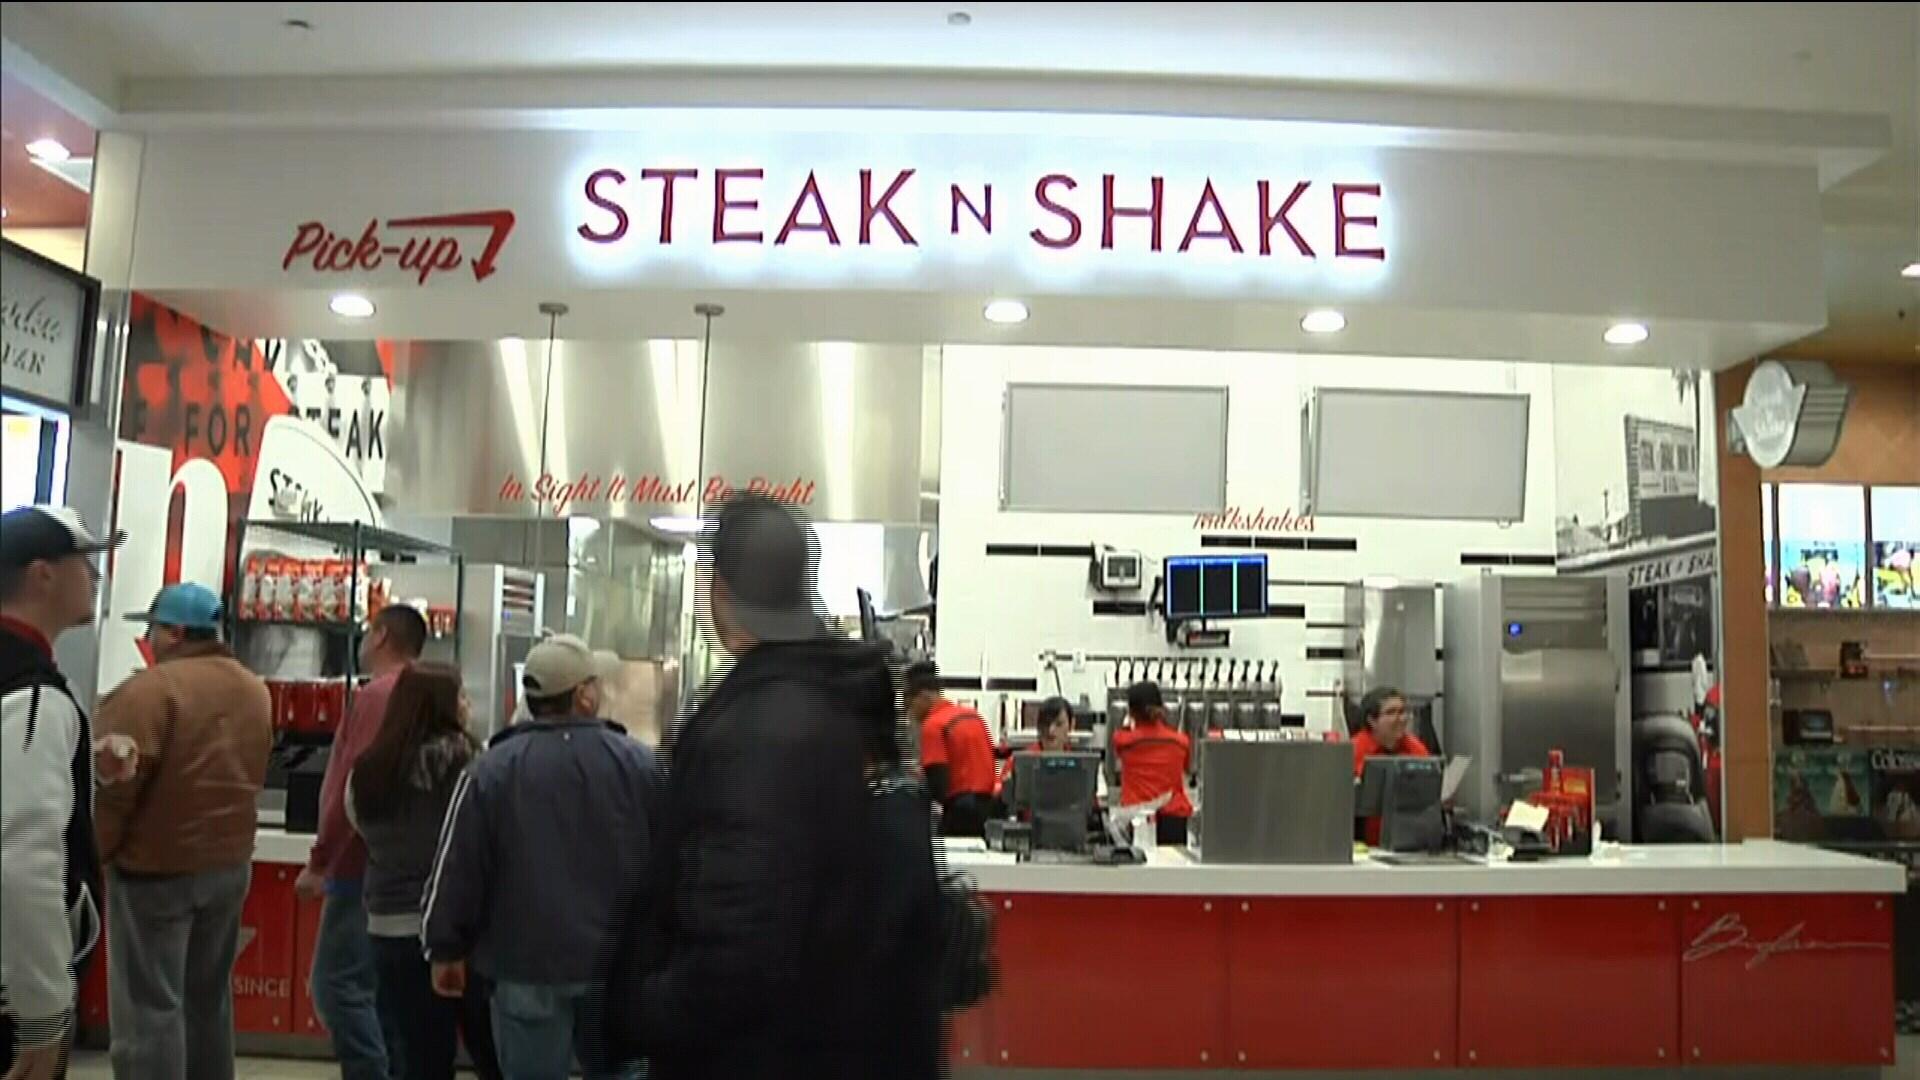 Steak N' Shake is preparing to open at La Palmera's food court on Saturday.